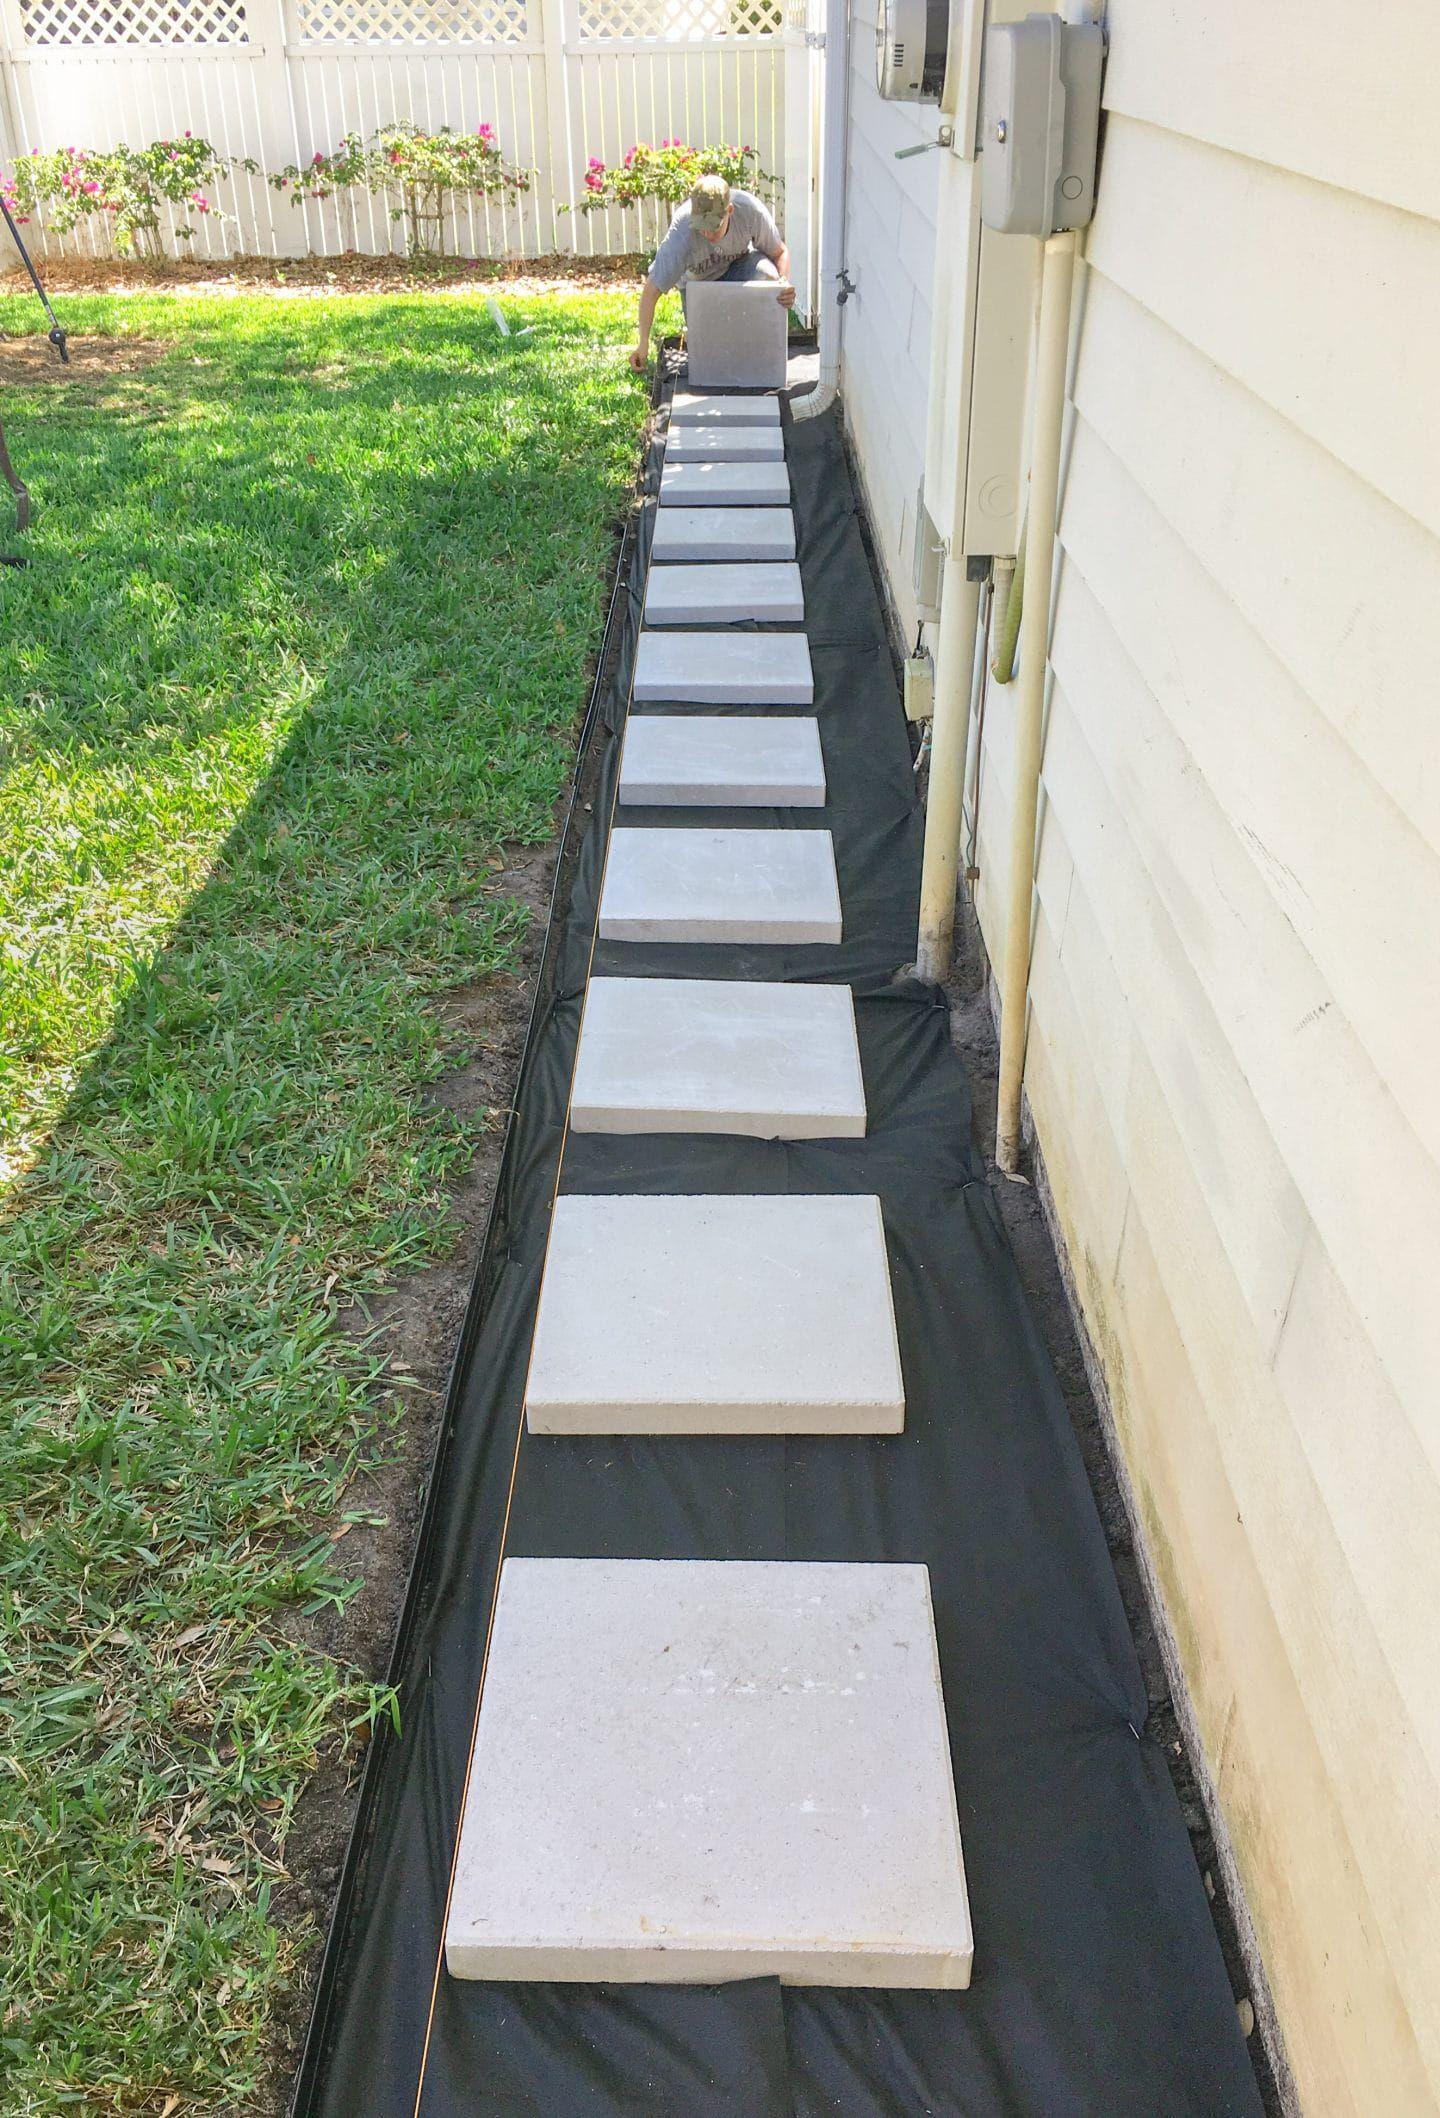 Building the Paver Patio #backyardpatiodesigns